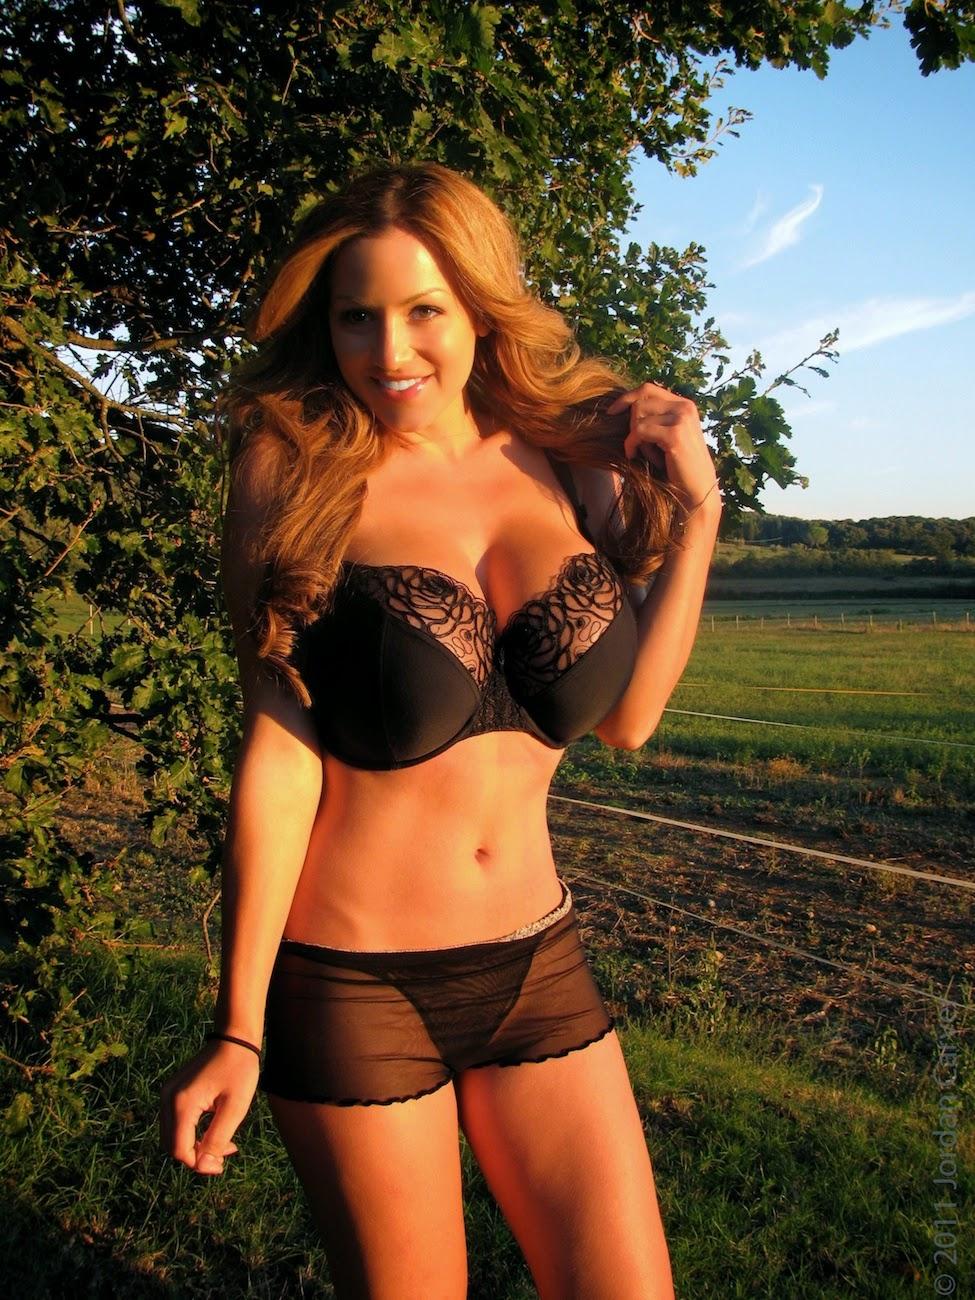 Jordan Carver Big Boobs In Black See Through Bra And Panty -1149